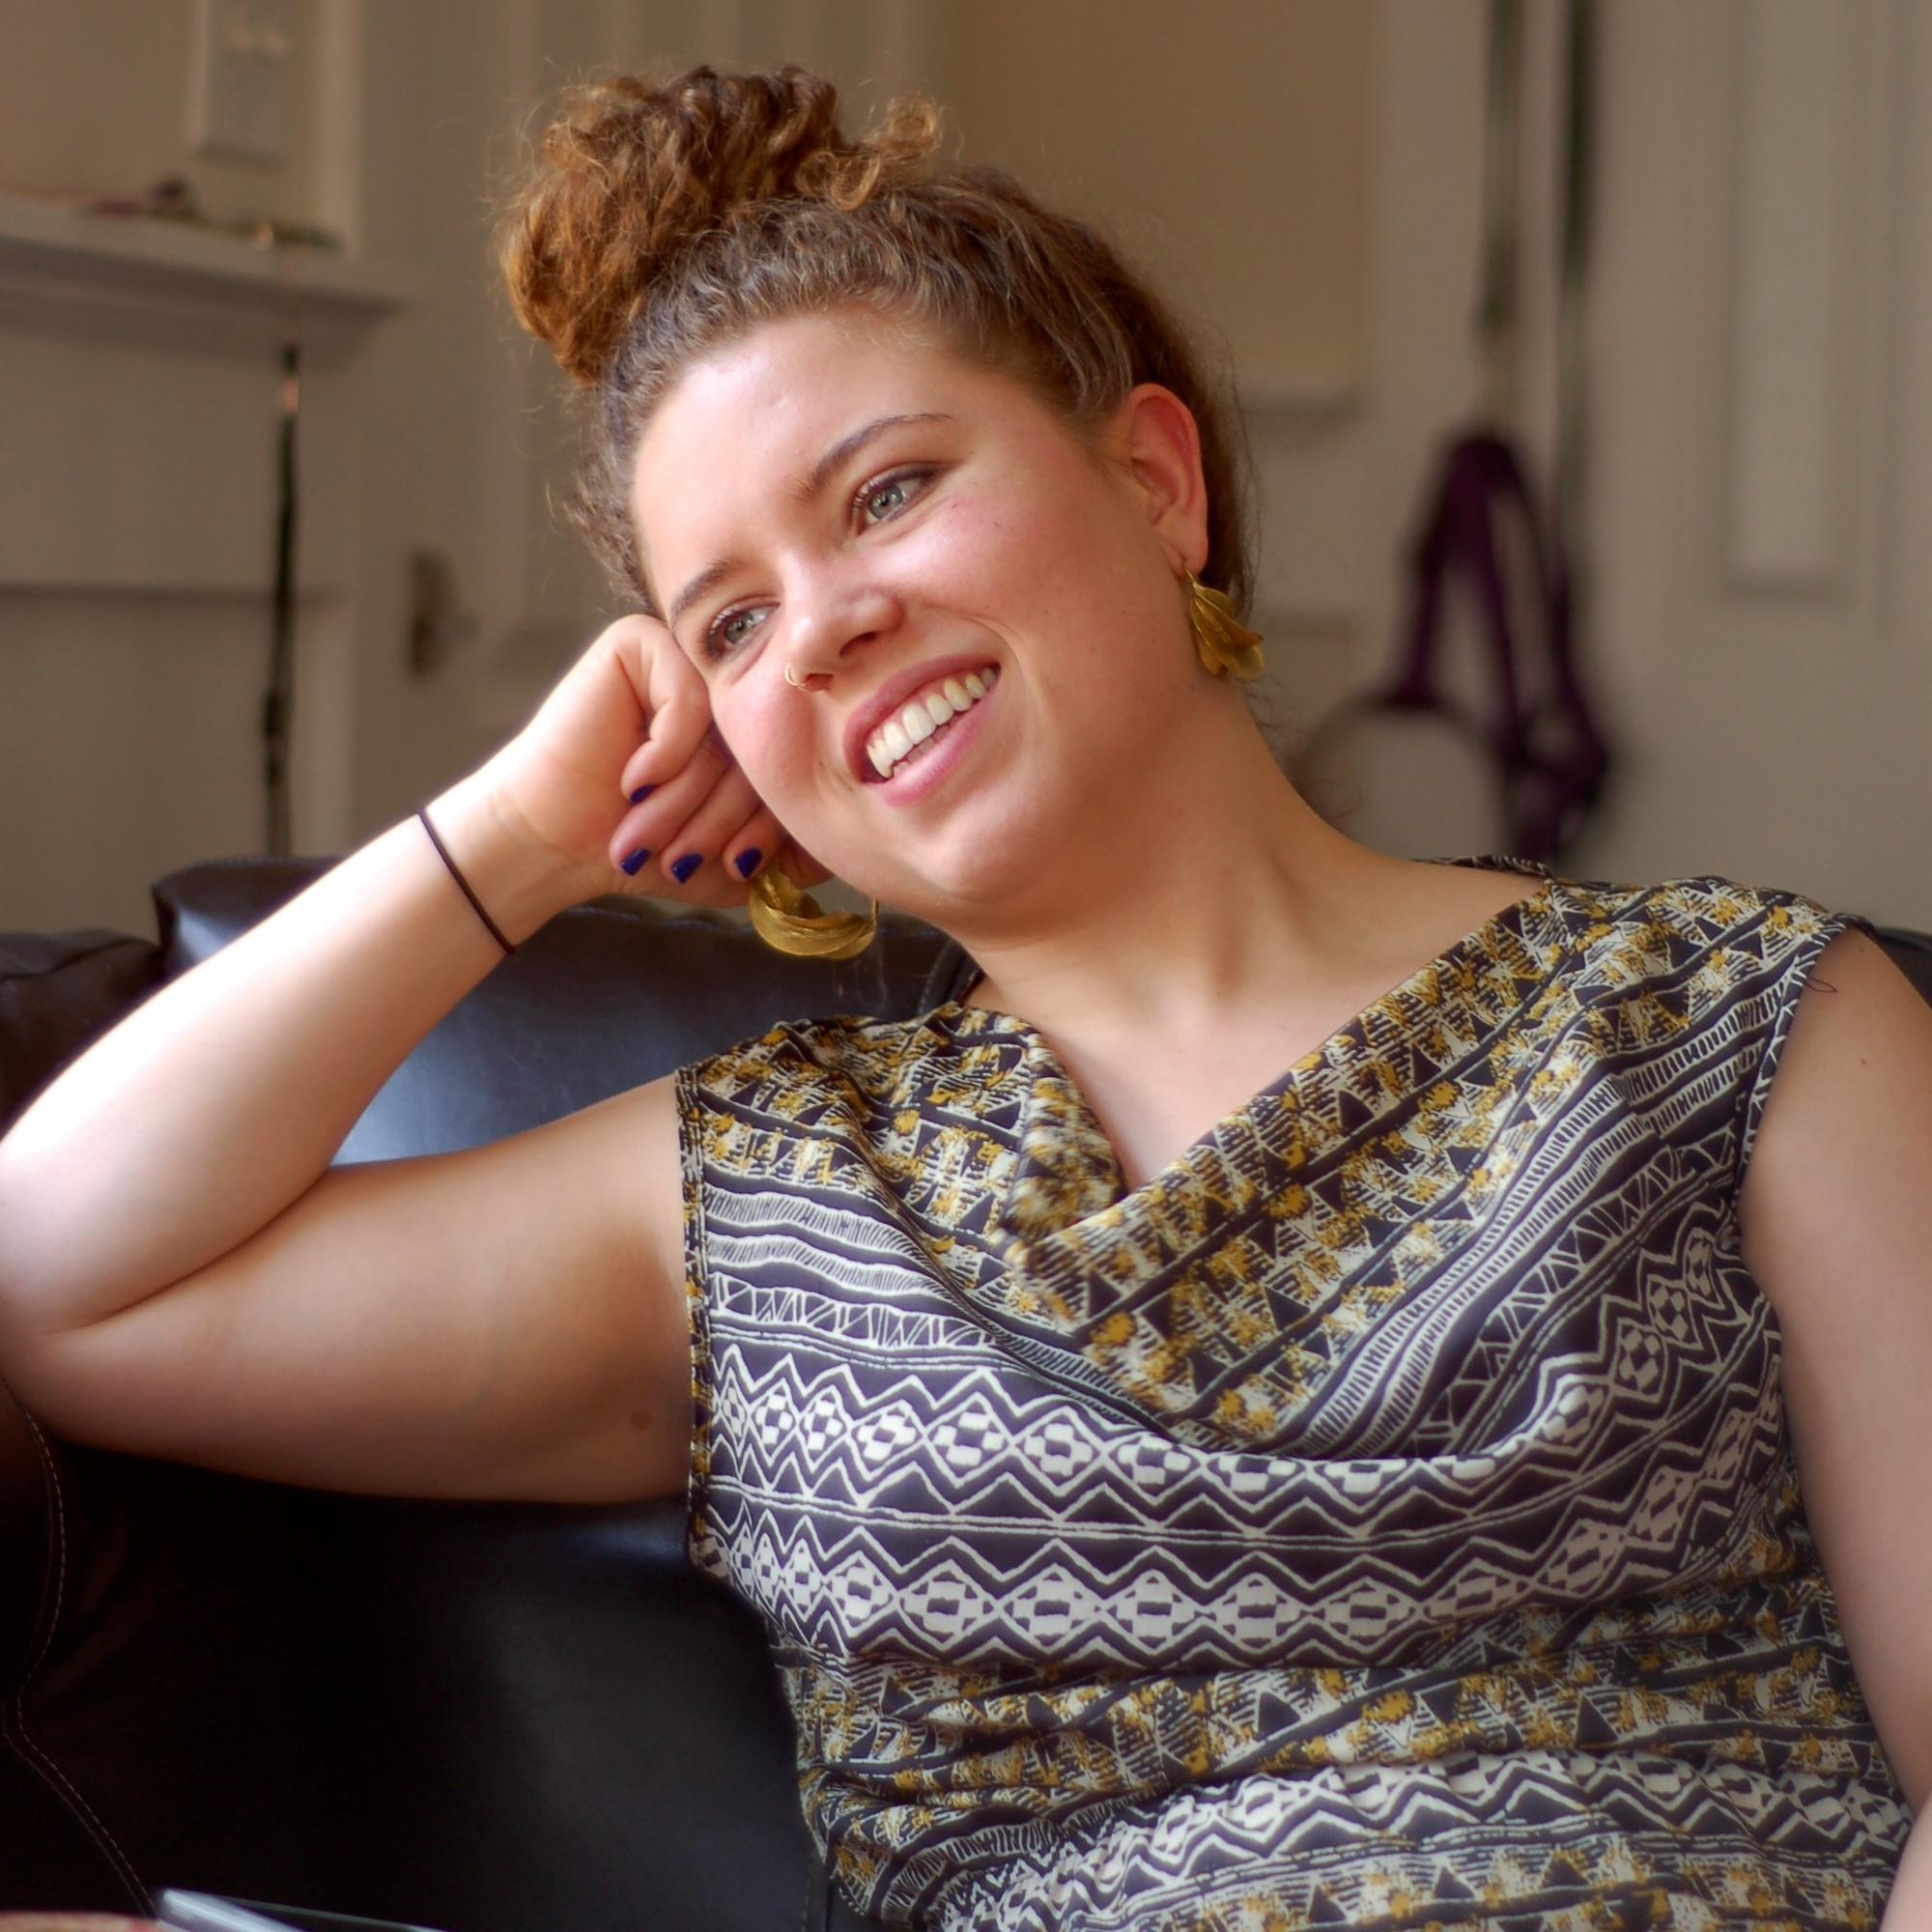 Alison Kibbe